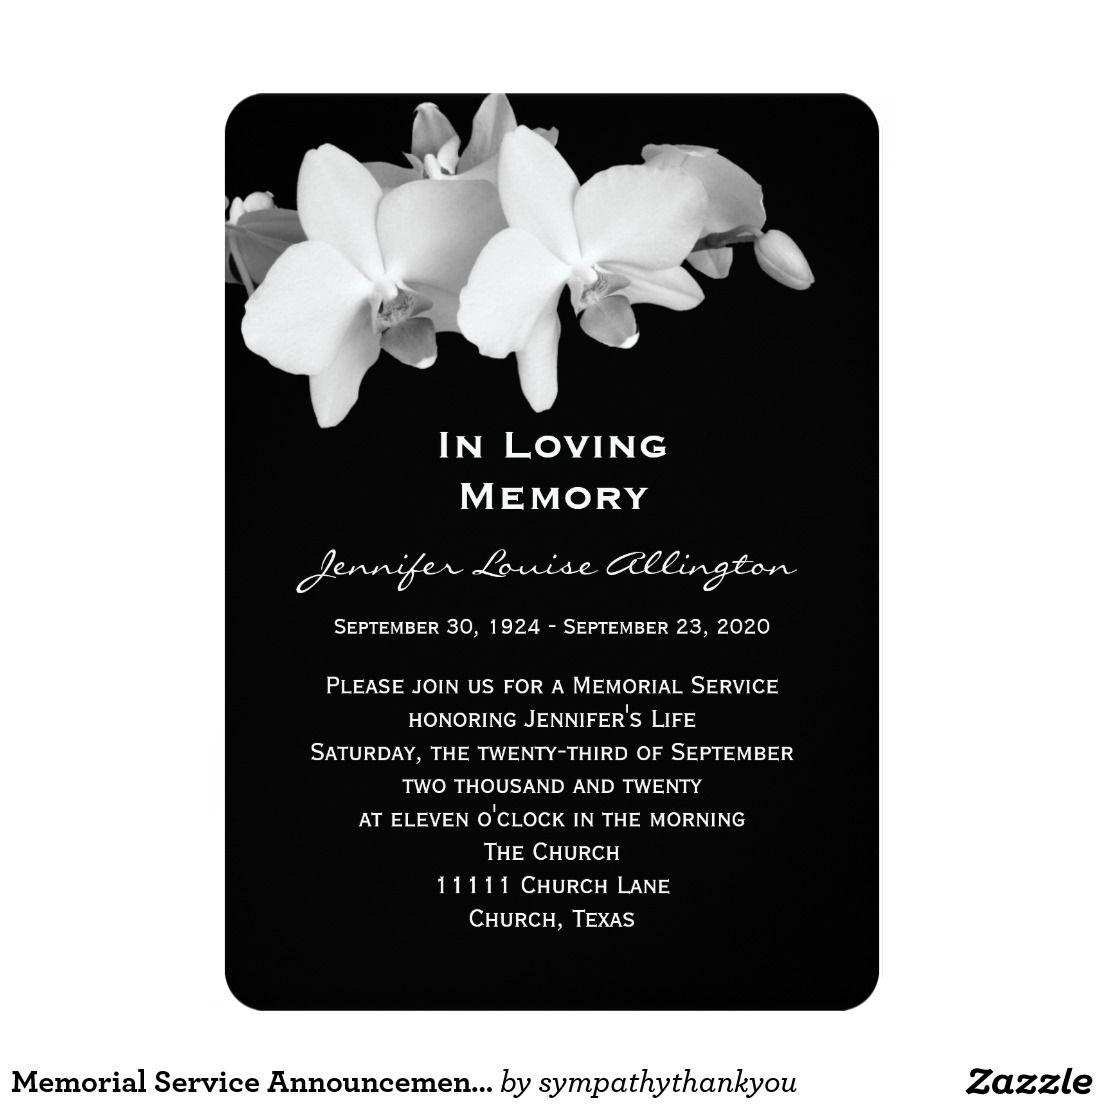 Memorial service card template datariouruguay 11 funeral card templates free psd ai eps format stopboris Gallery